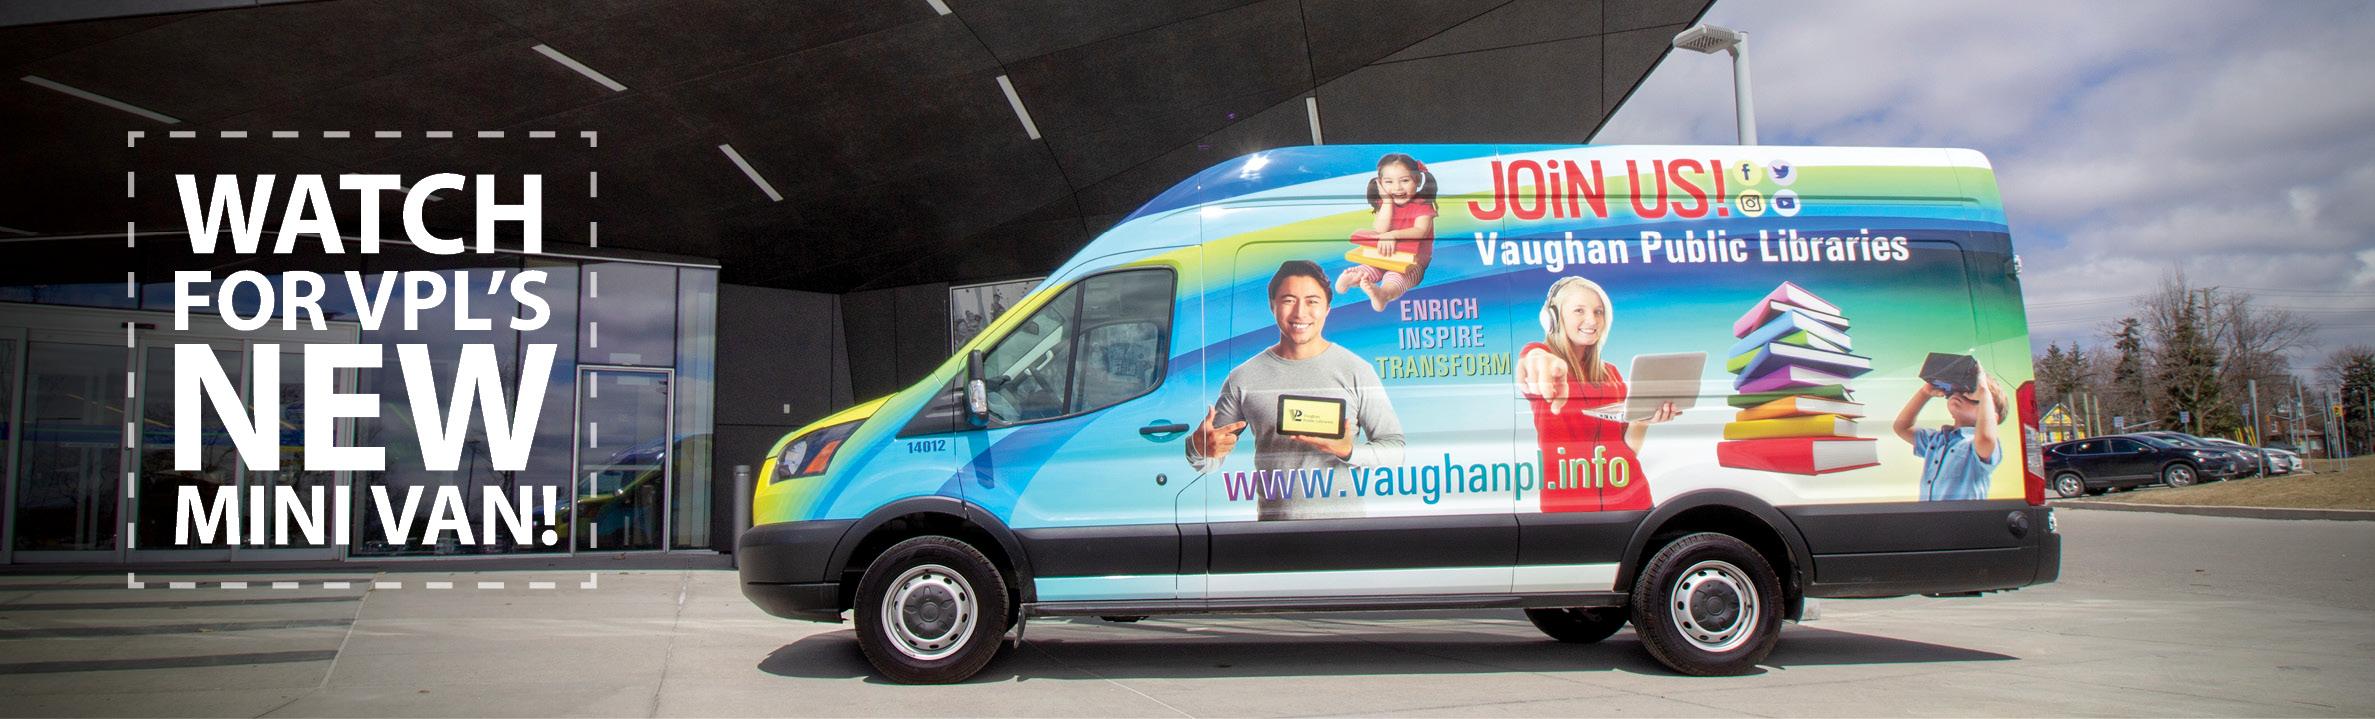 VPL Mini Van Web Banner.jpg